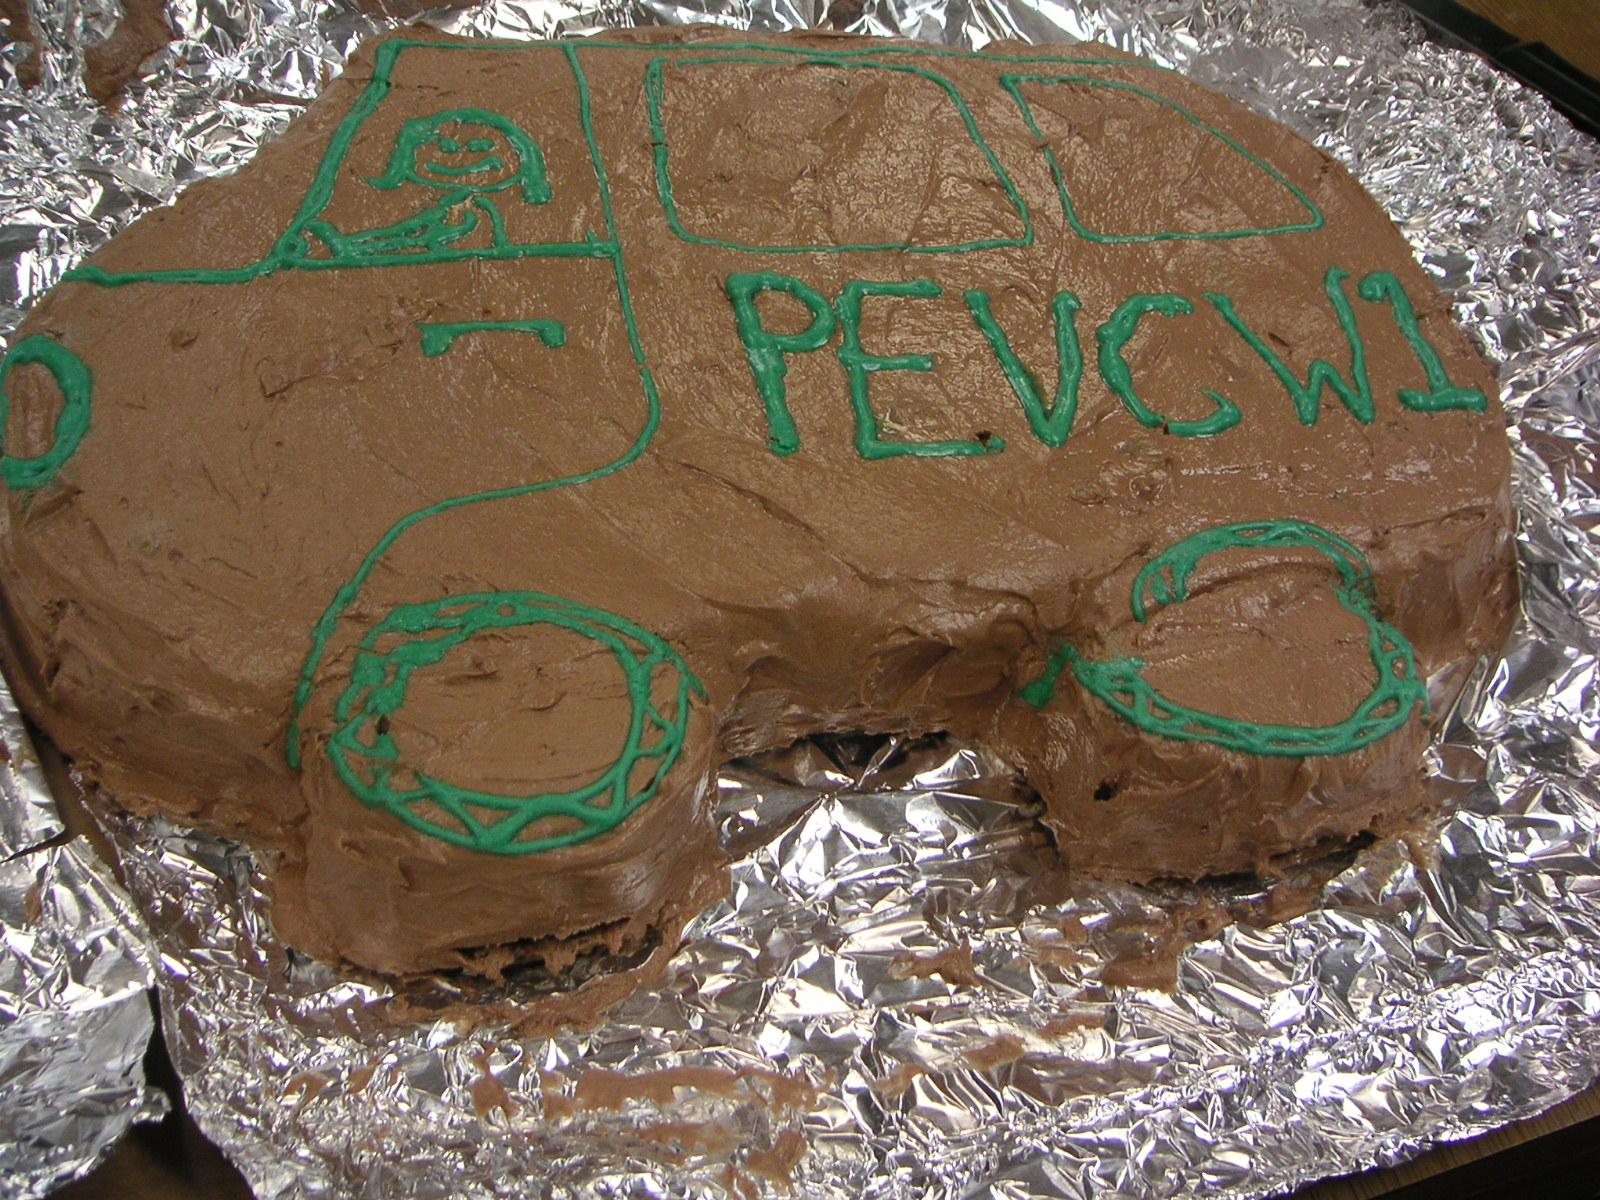 [The+Cake]